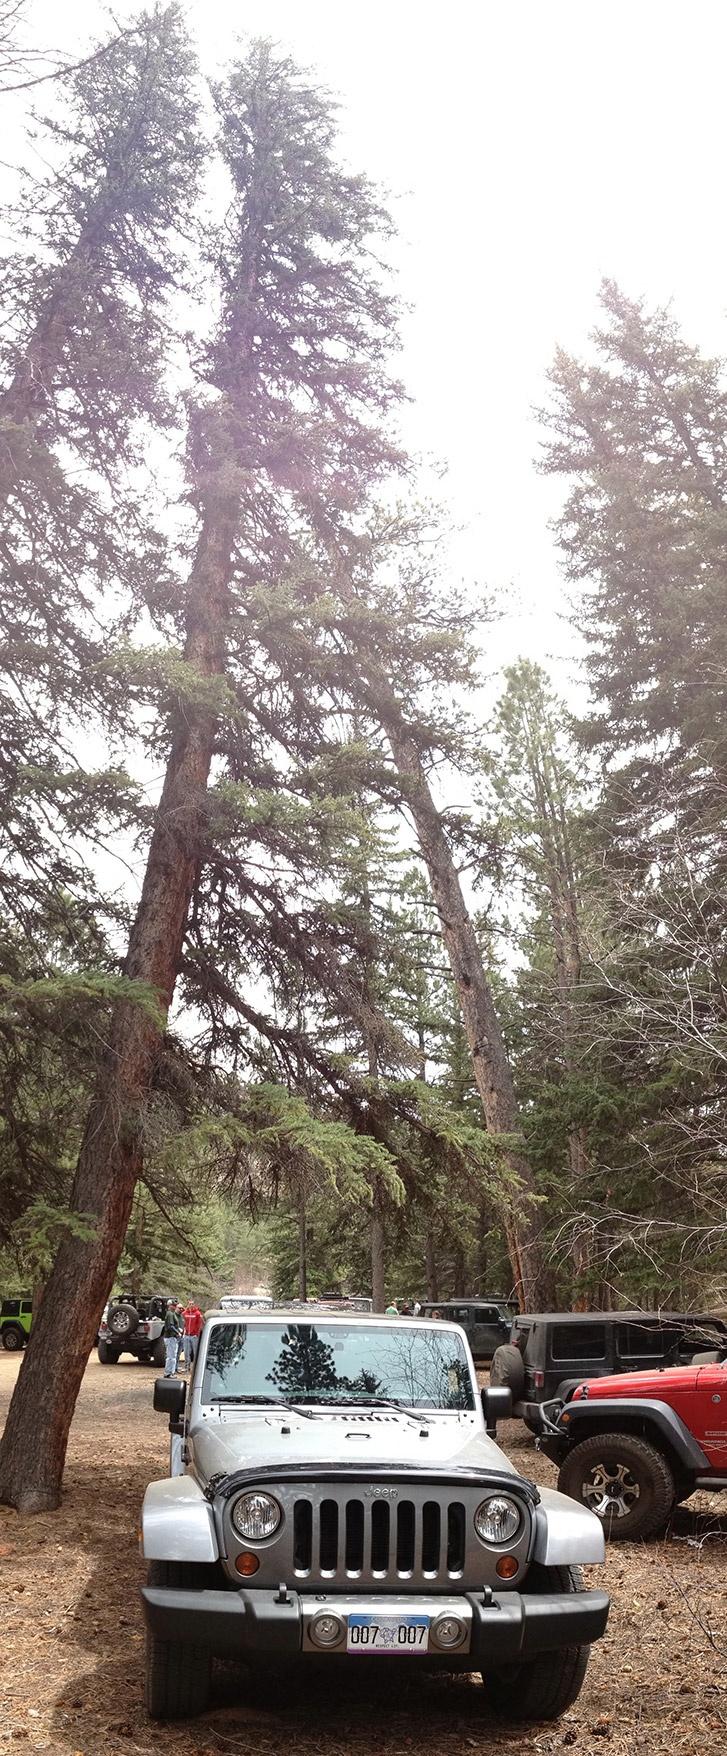 Jeep Wranger | Oscar Mike edition | Colorado Jeep Trail | China Wall